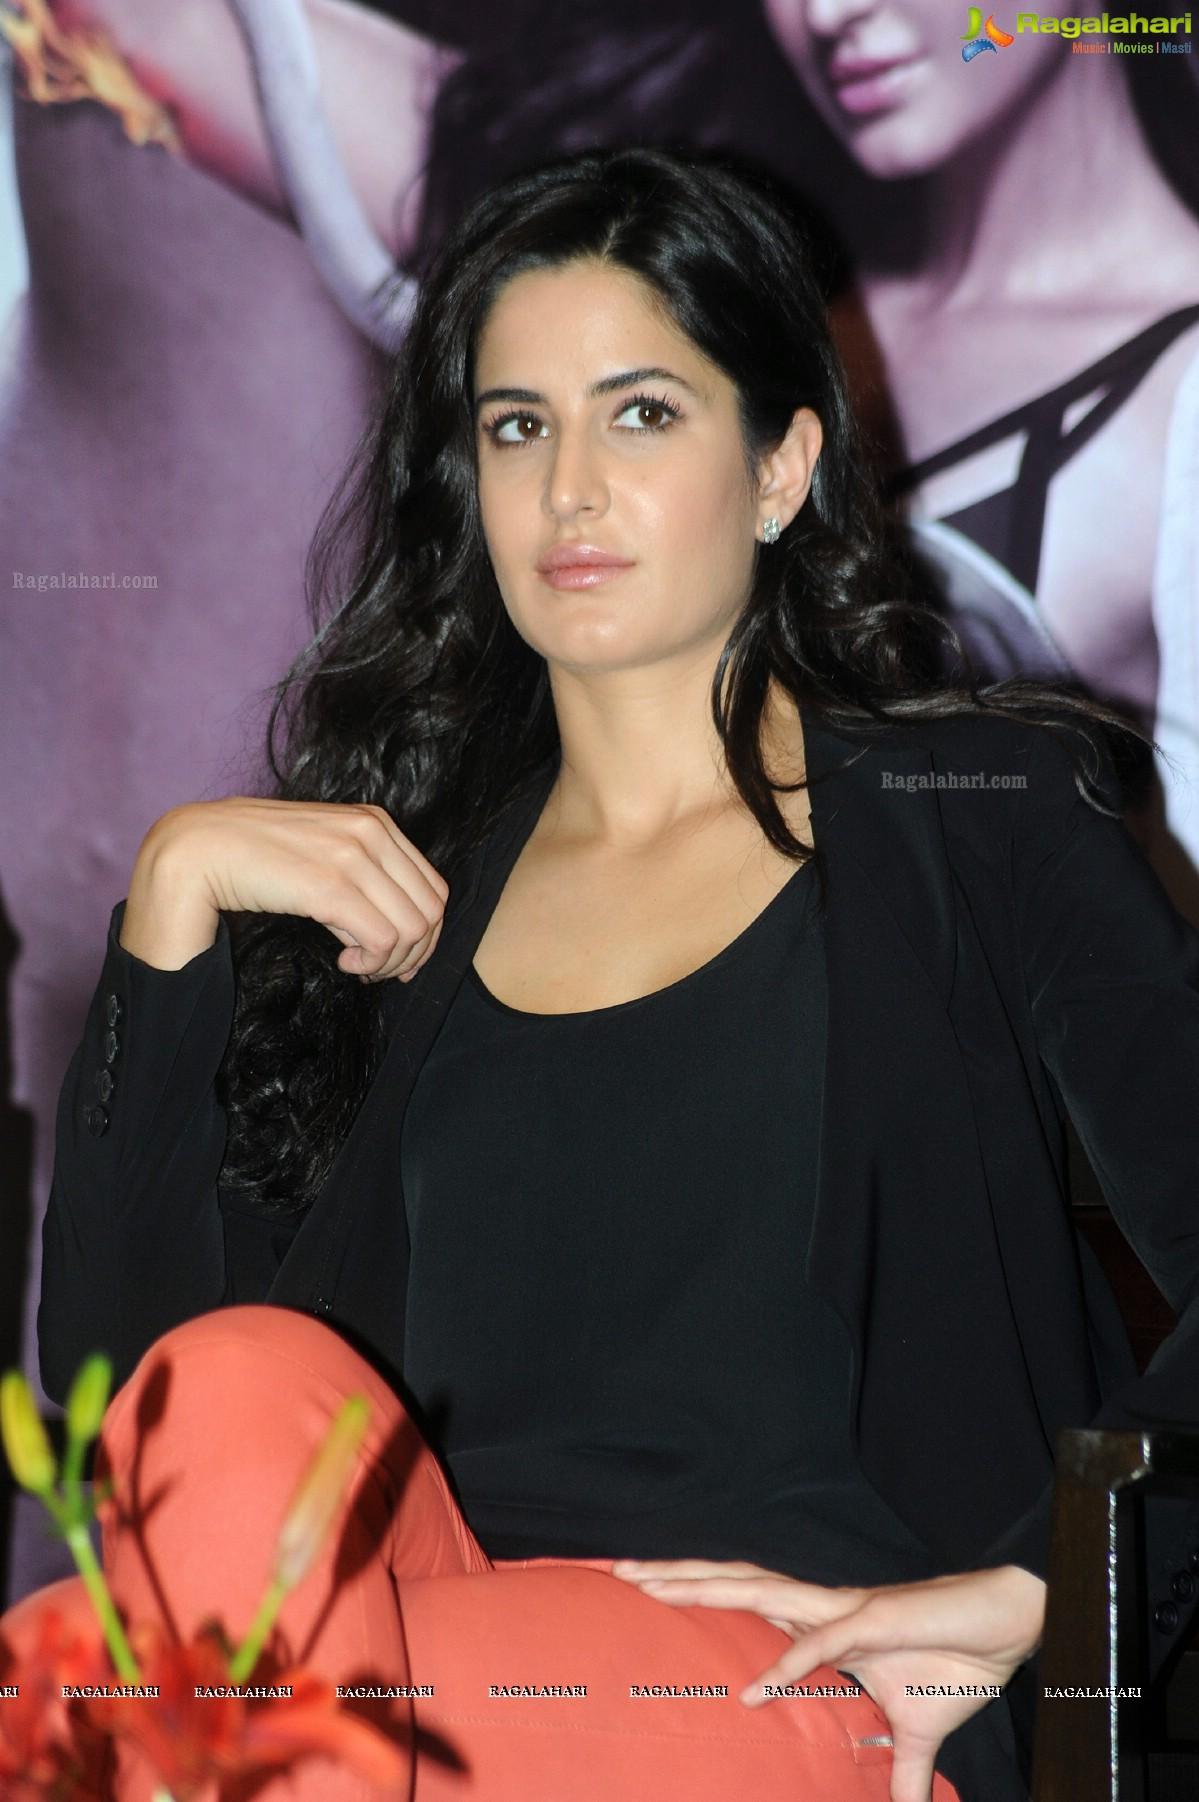 katrina kaif image 38   tollywood actress hot images,images, pics